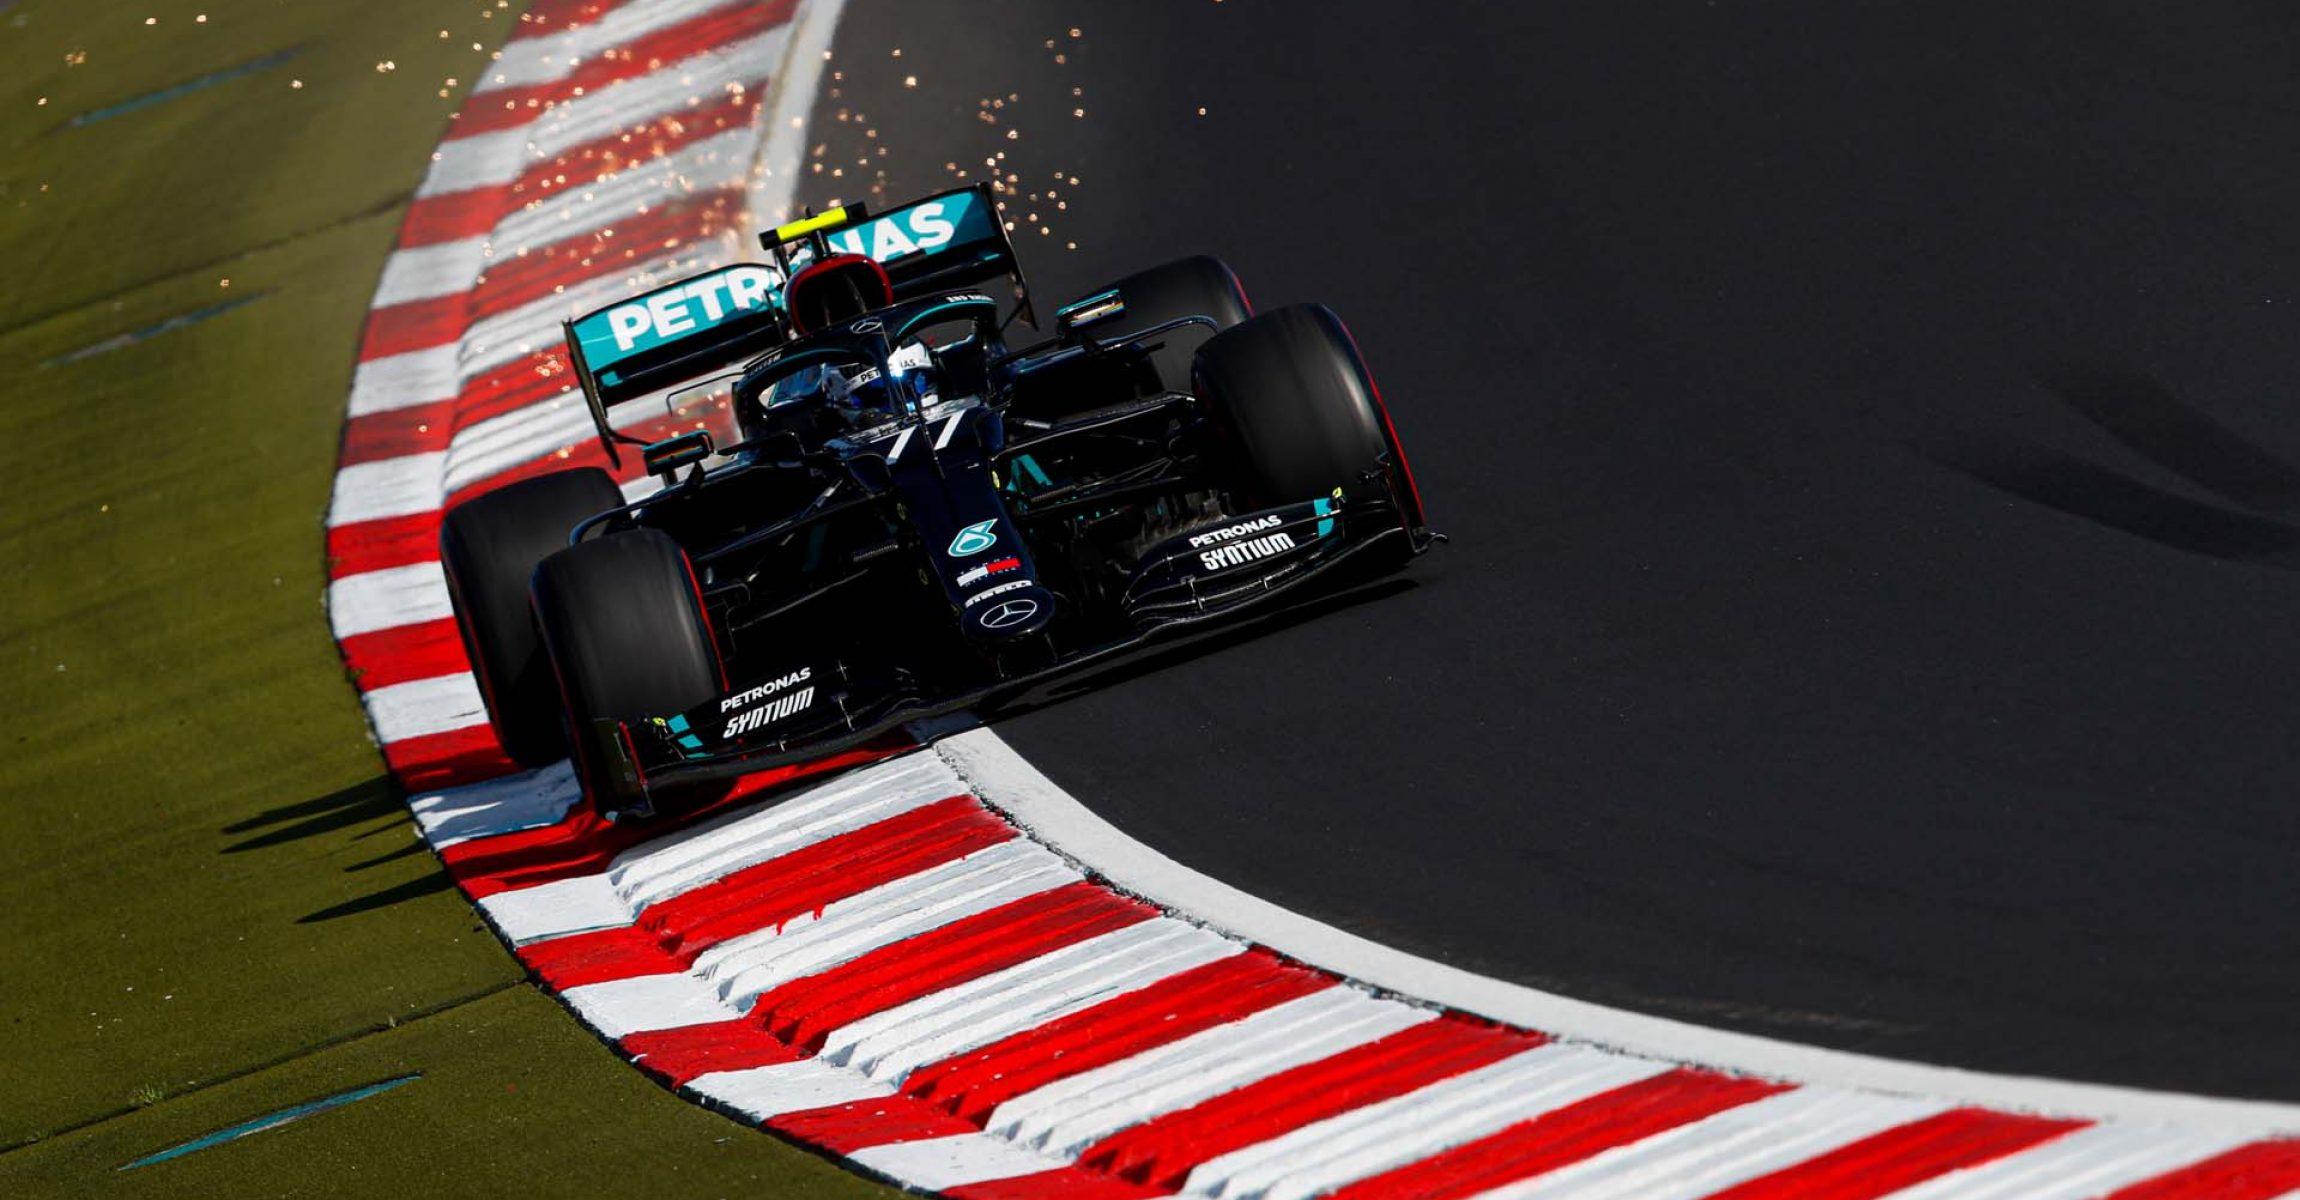 2020 Eifel Grand Prix, Saturday - LAT Images Valtteri Bottas Mercedes sparks